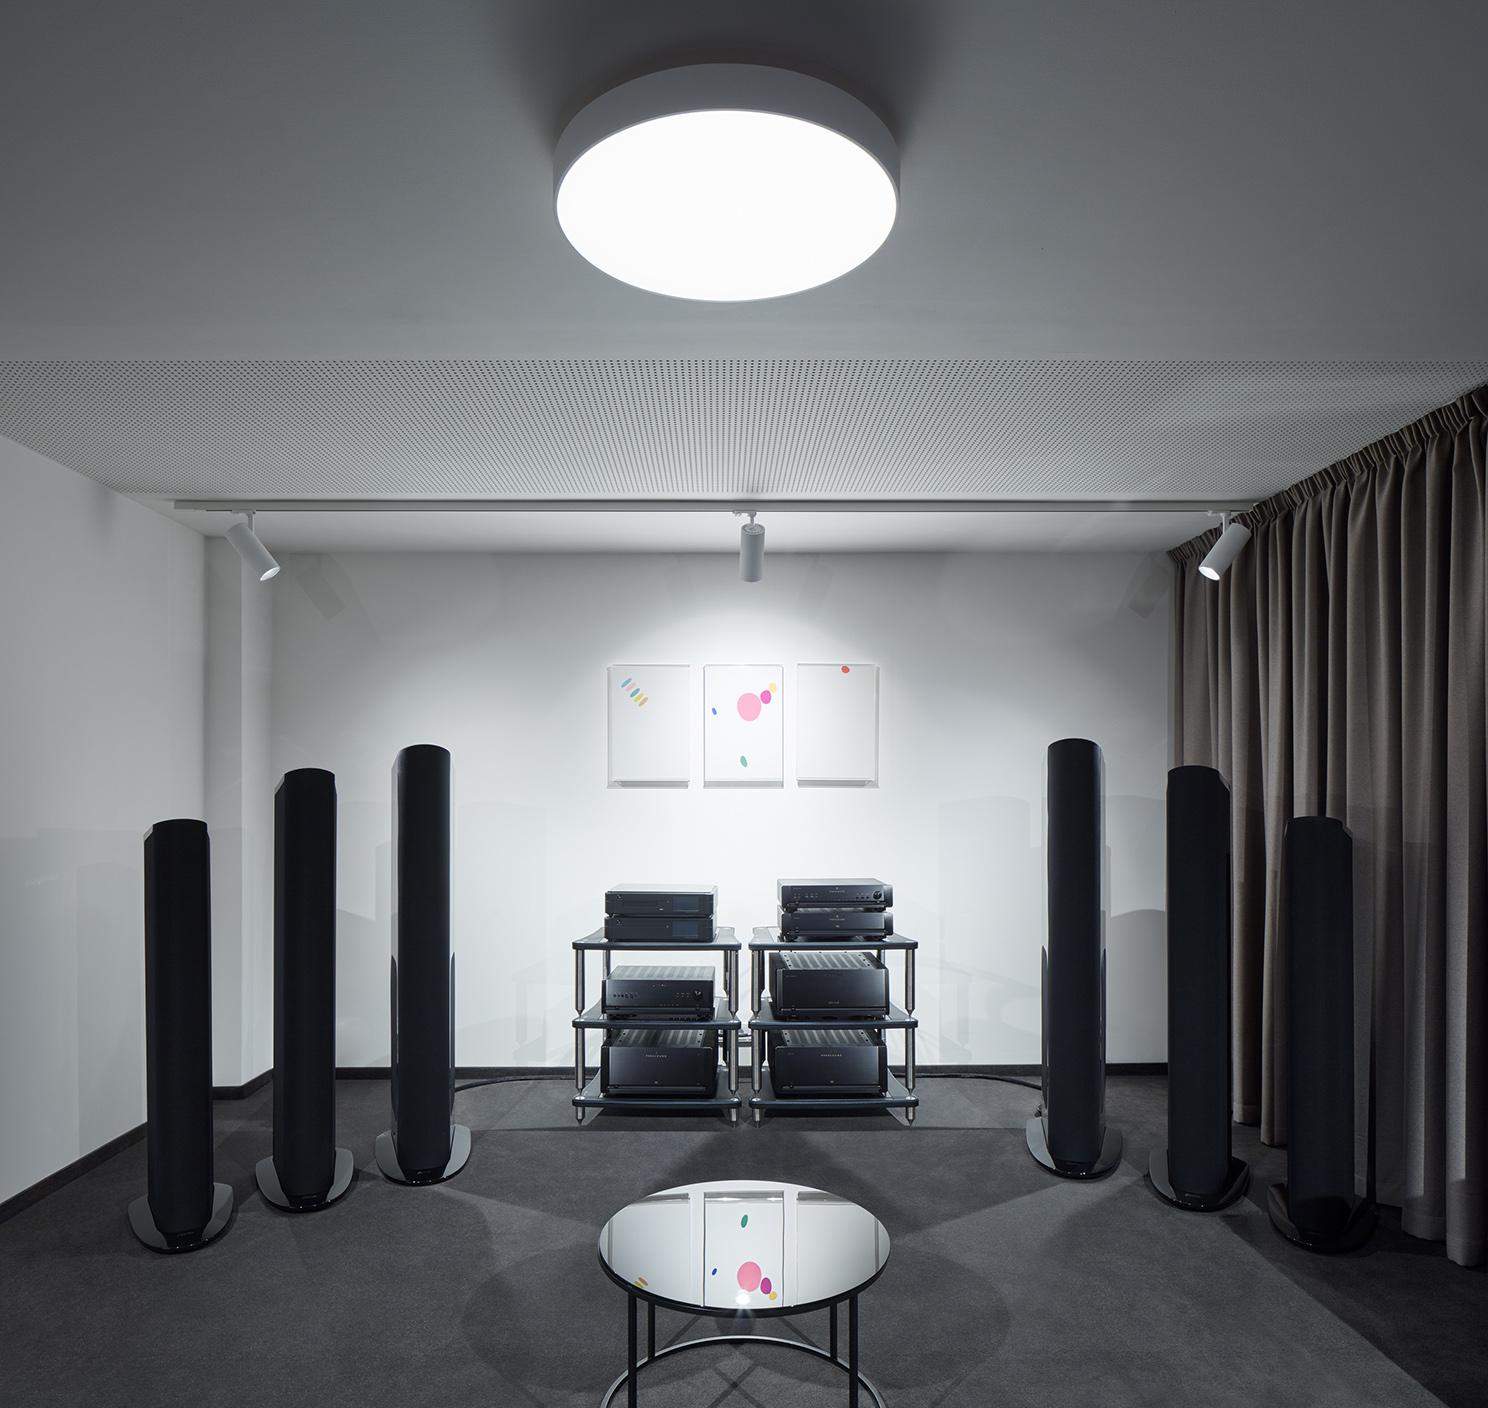 VOIX_BoysPlayNice_13_Barbora_Leblova_Interiors_Architecture